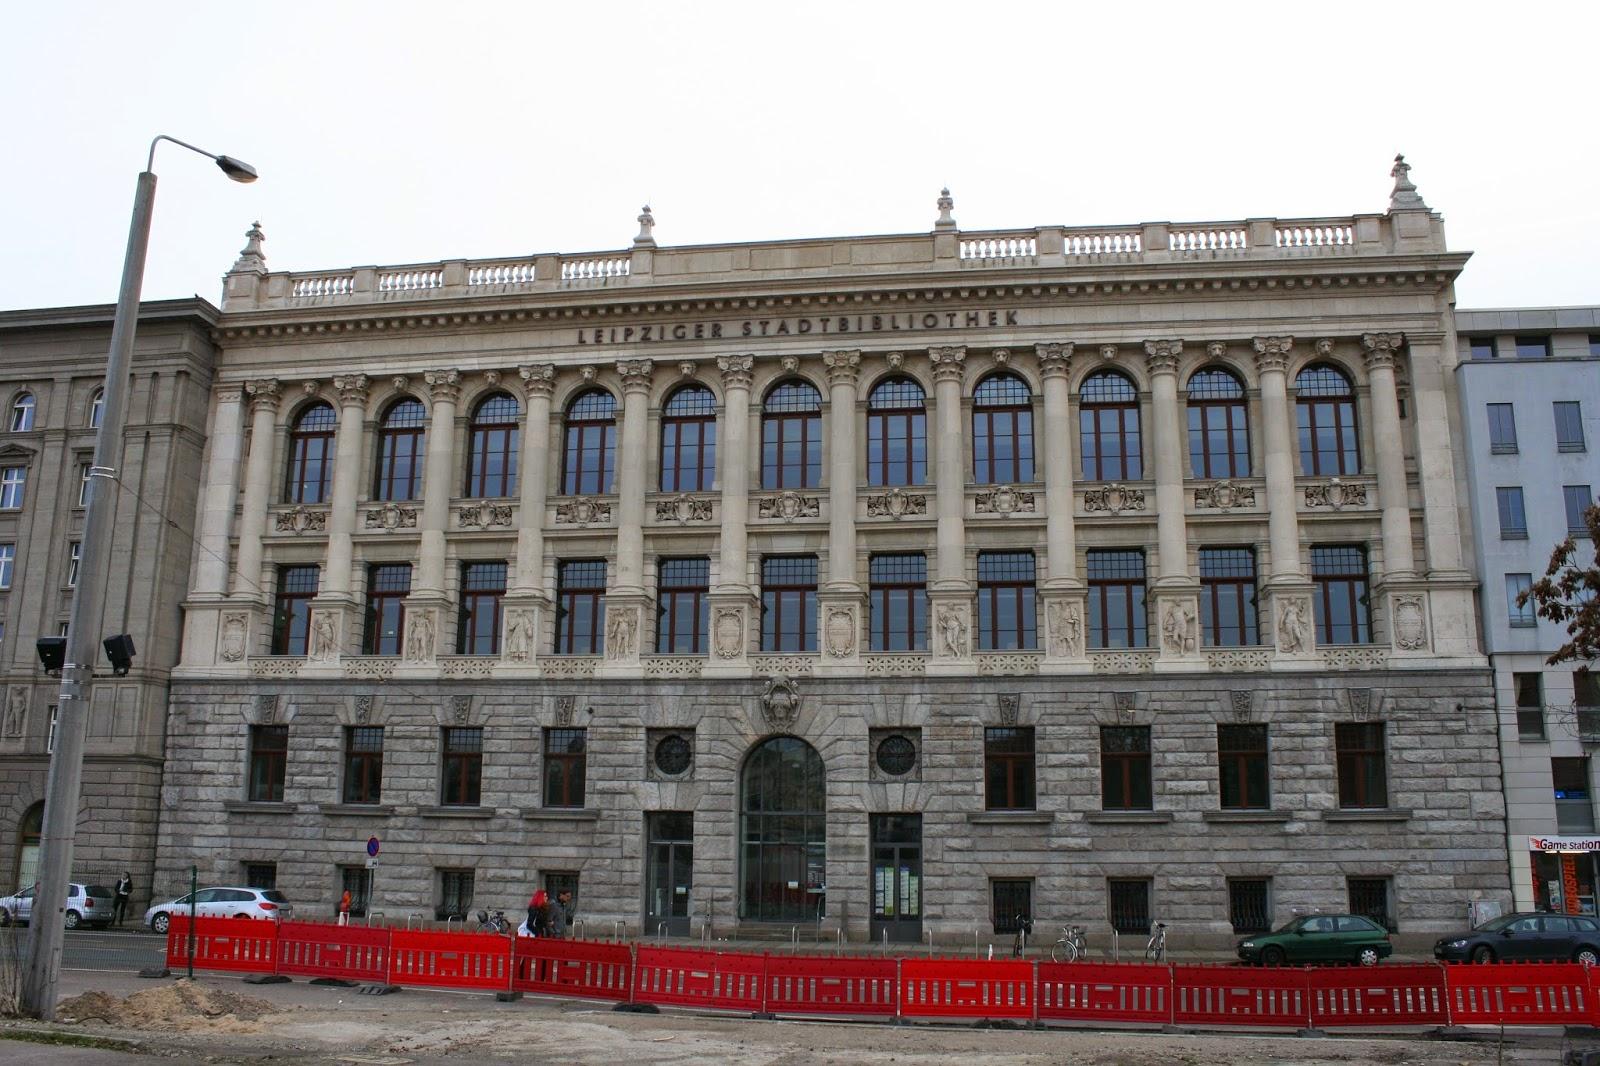 Stadtbibliothek, früher Altes Grassimuseum